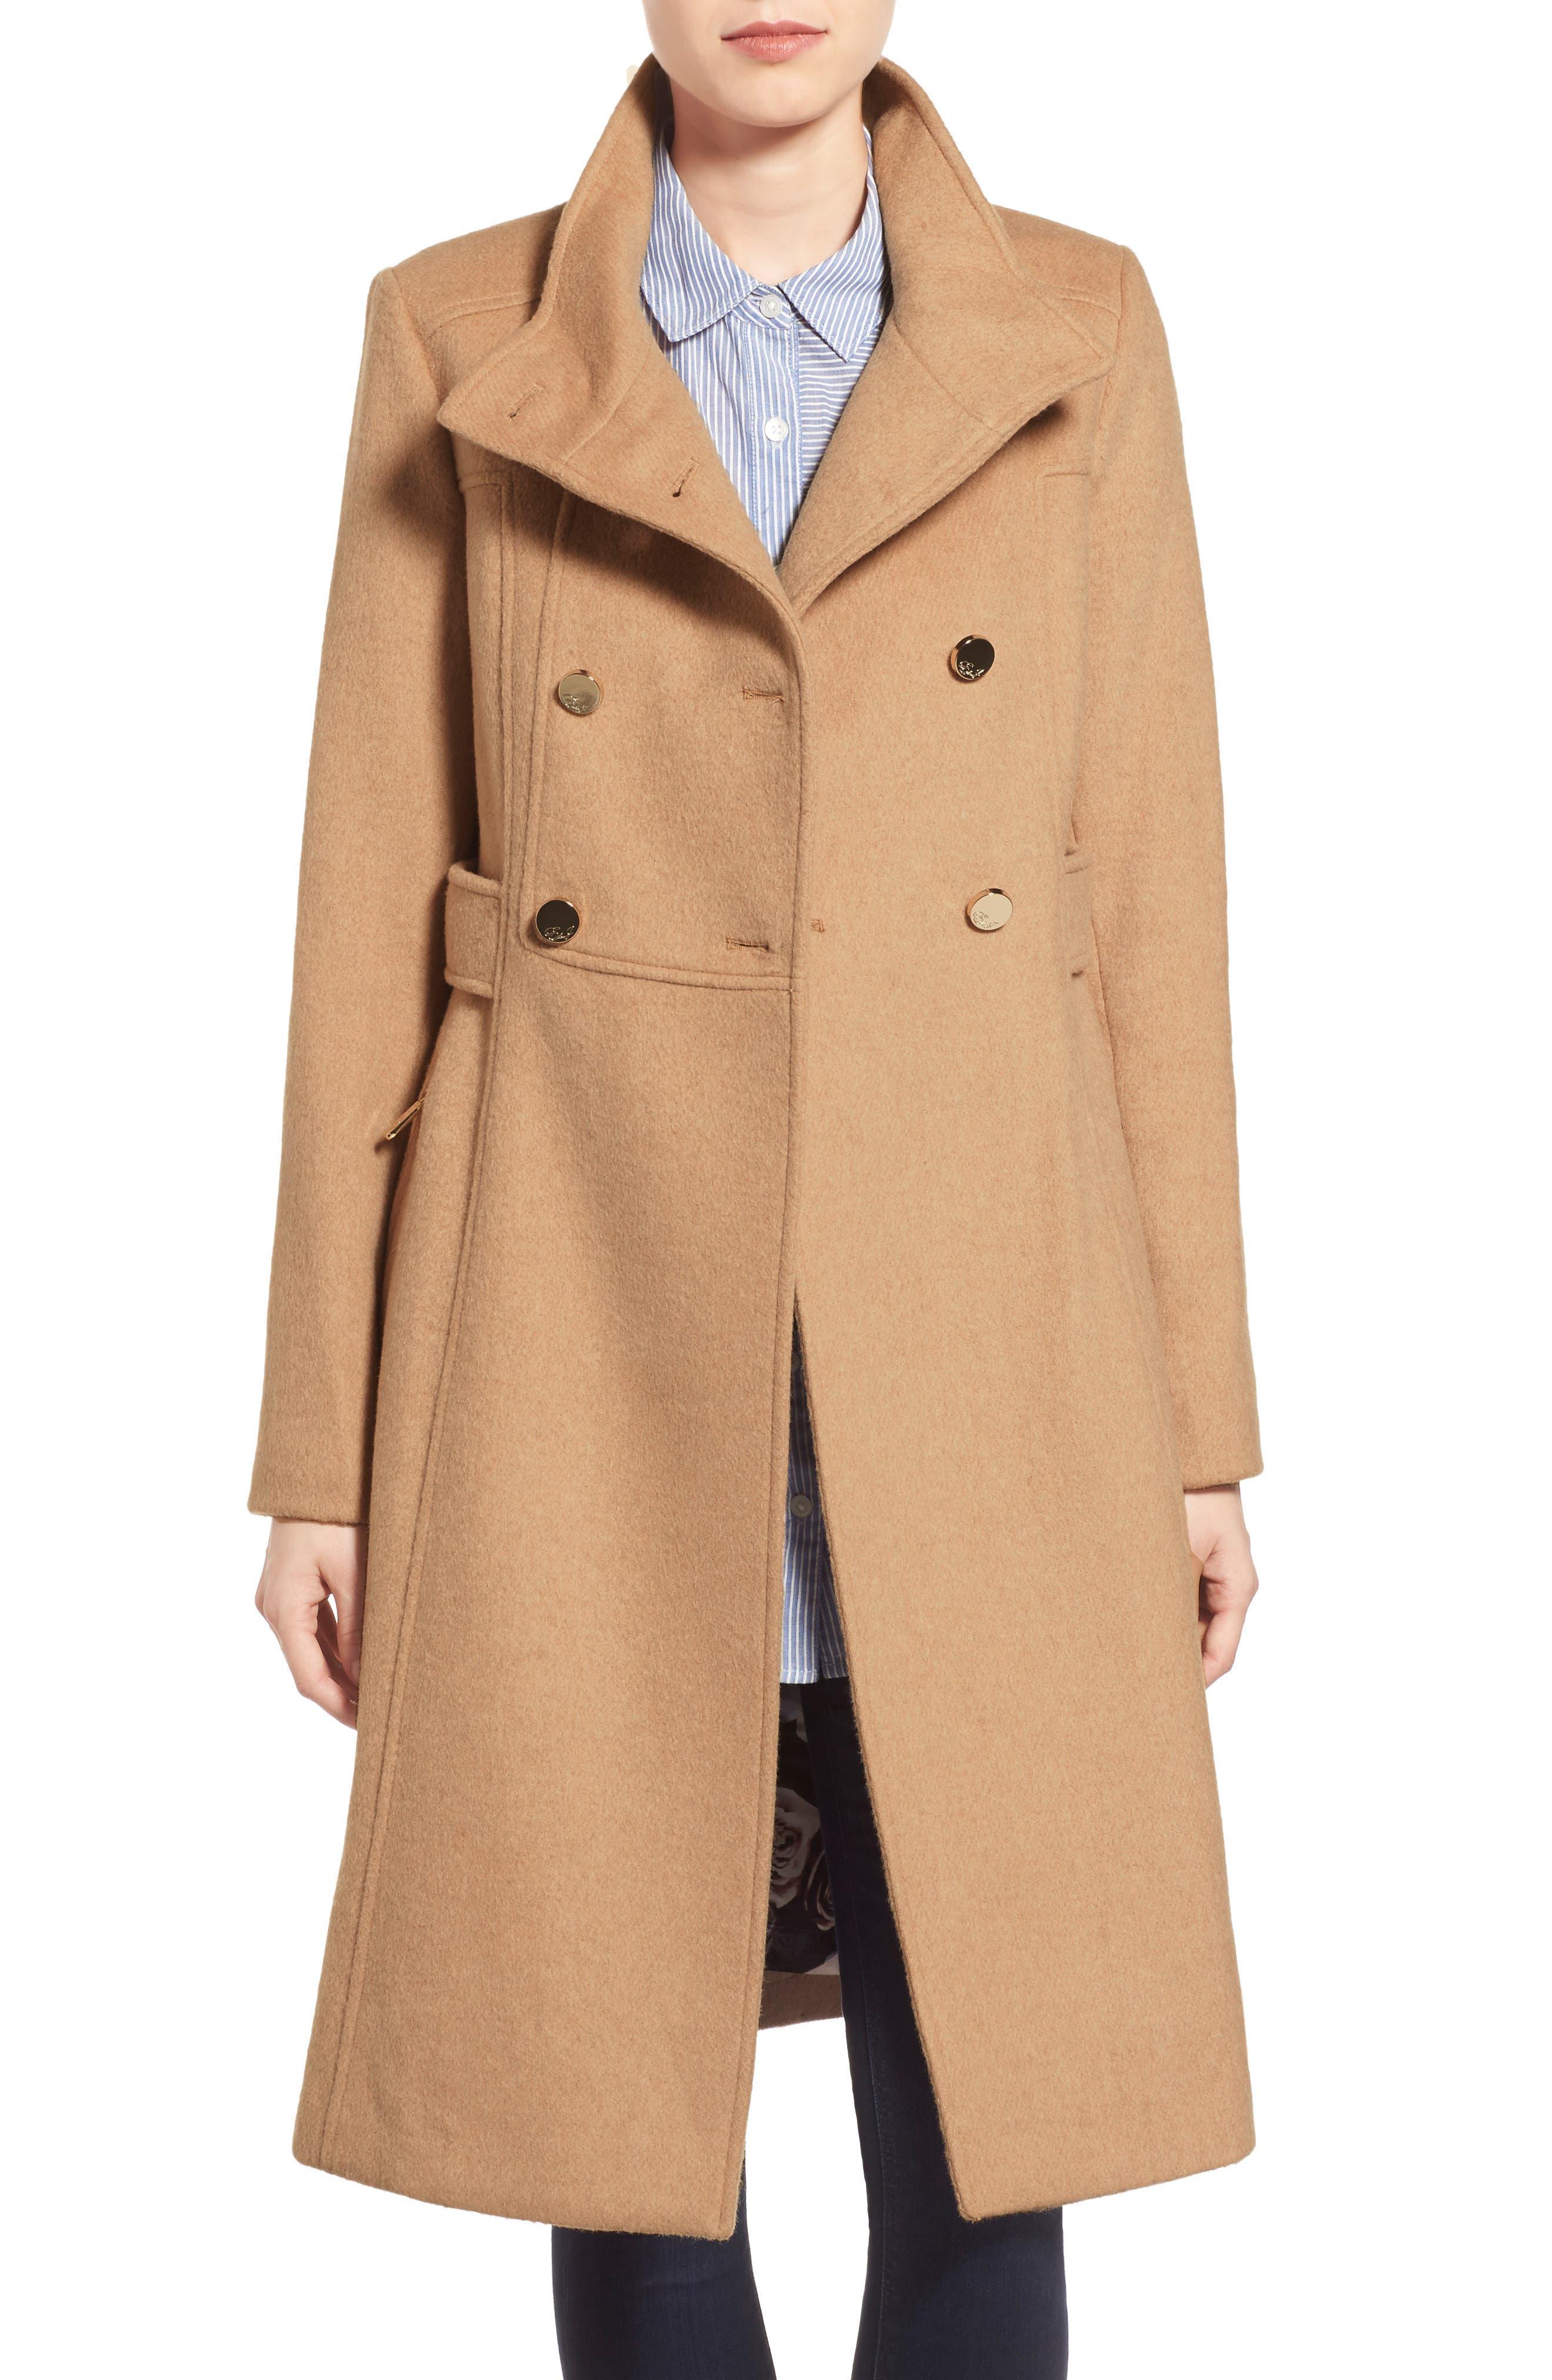 Wool Blend Long Military Coat,                             Main thumbnail 1, color,                             Camel